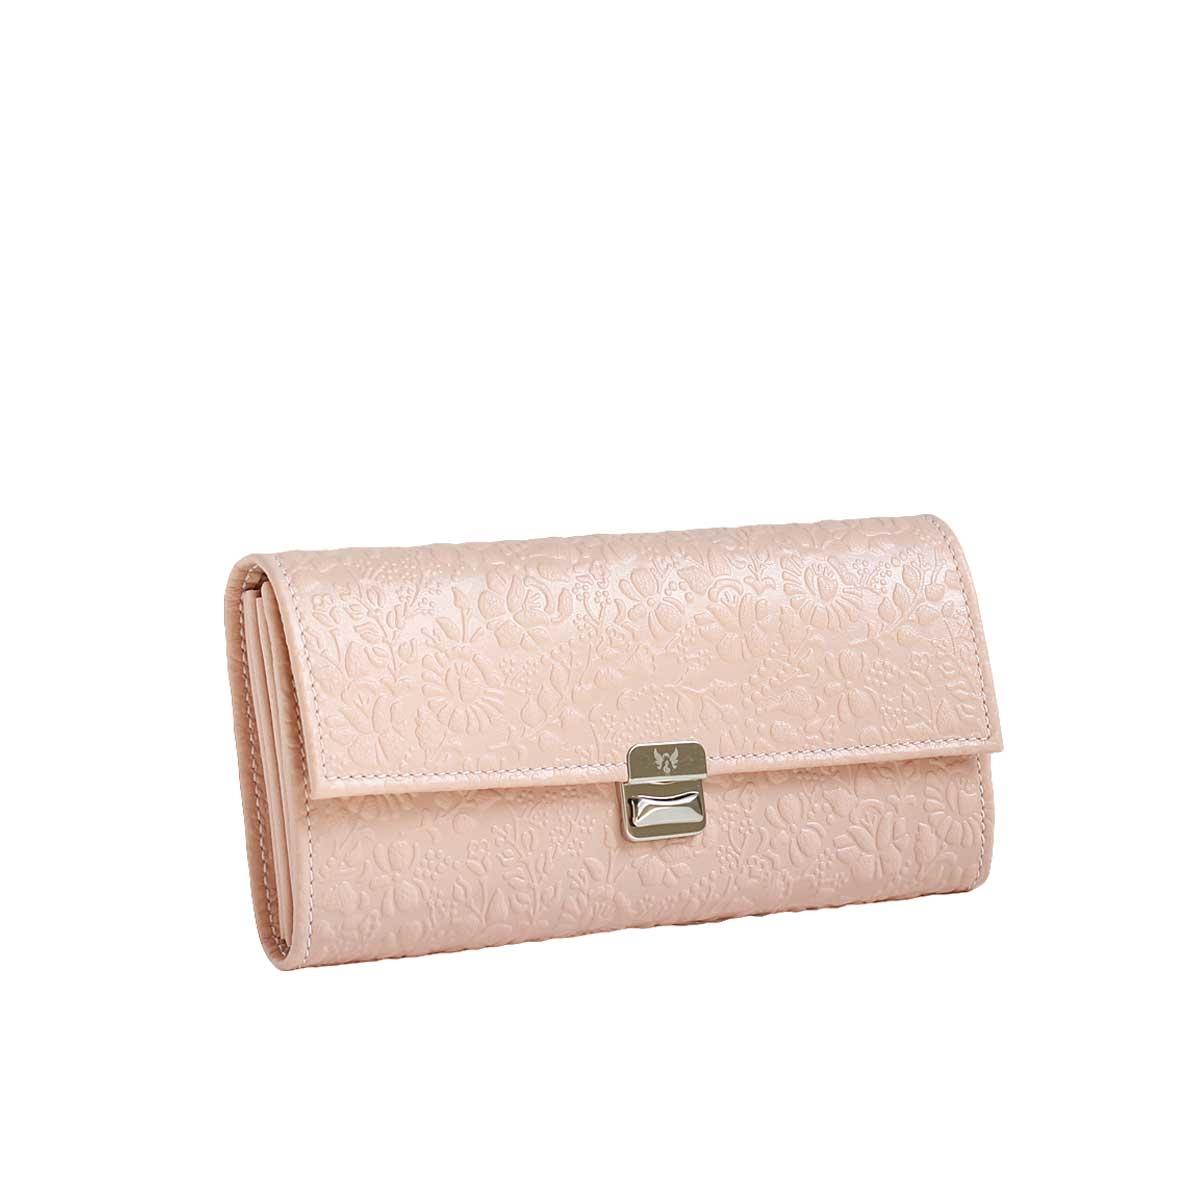 ziehharmonika geldbörsen leder puder rosa